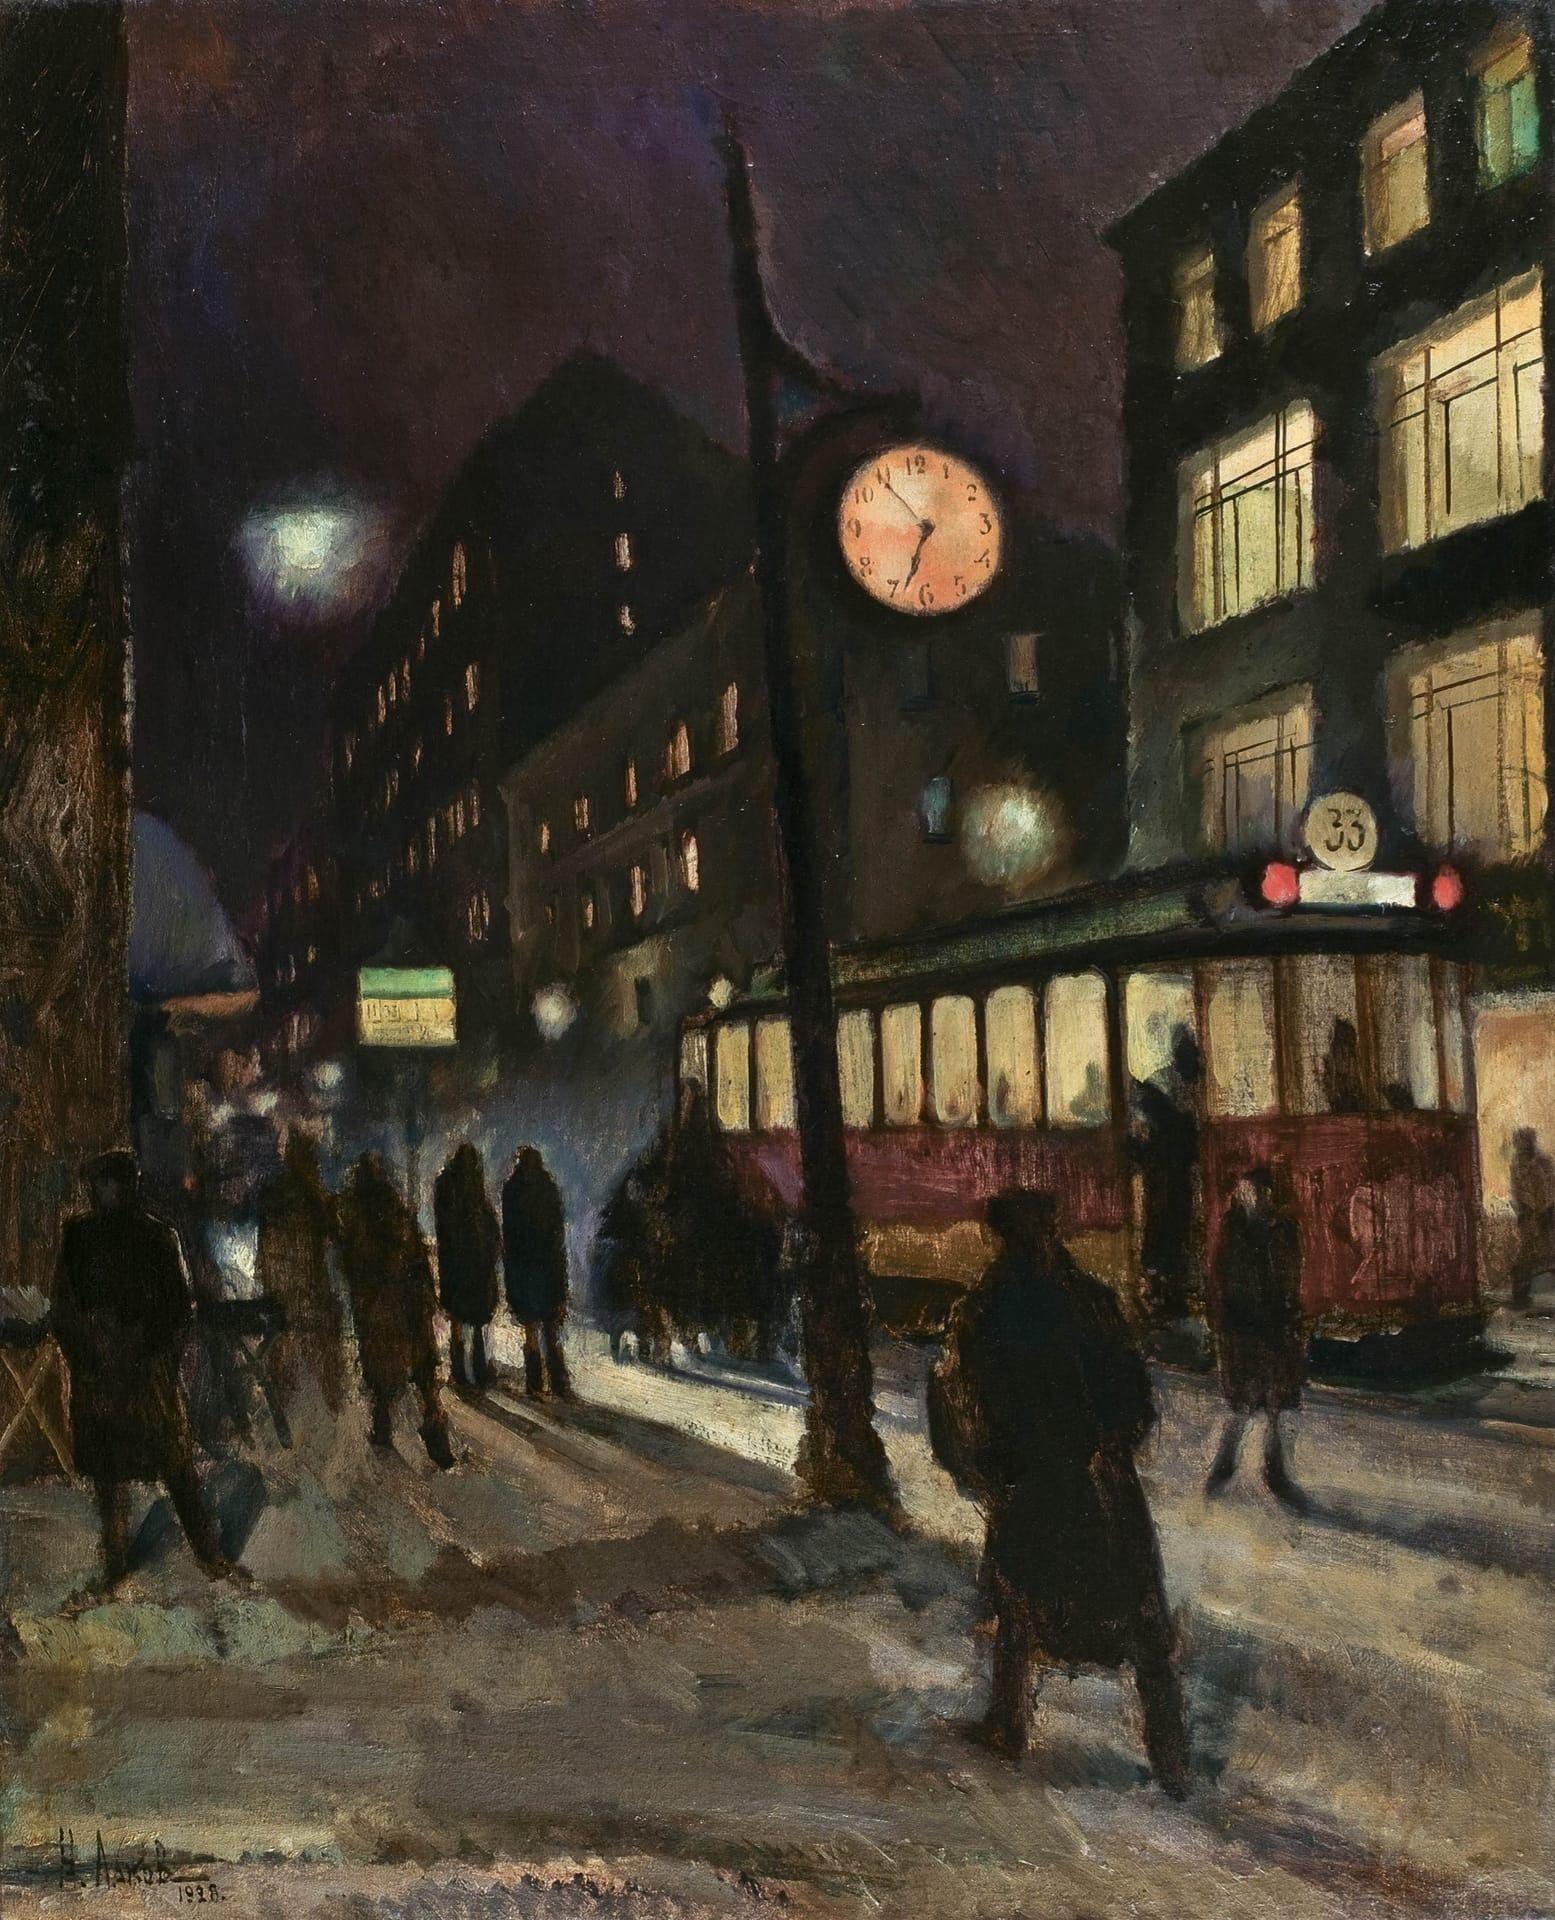 Николай Лаков (1894-1970) Вечерняя улица. Трамвай., 1928 год